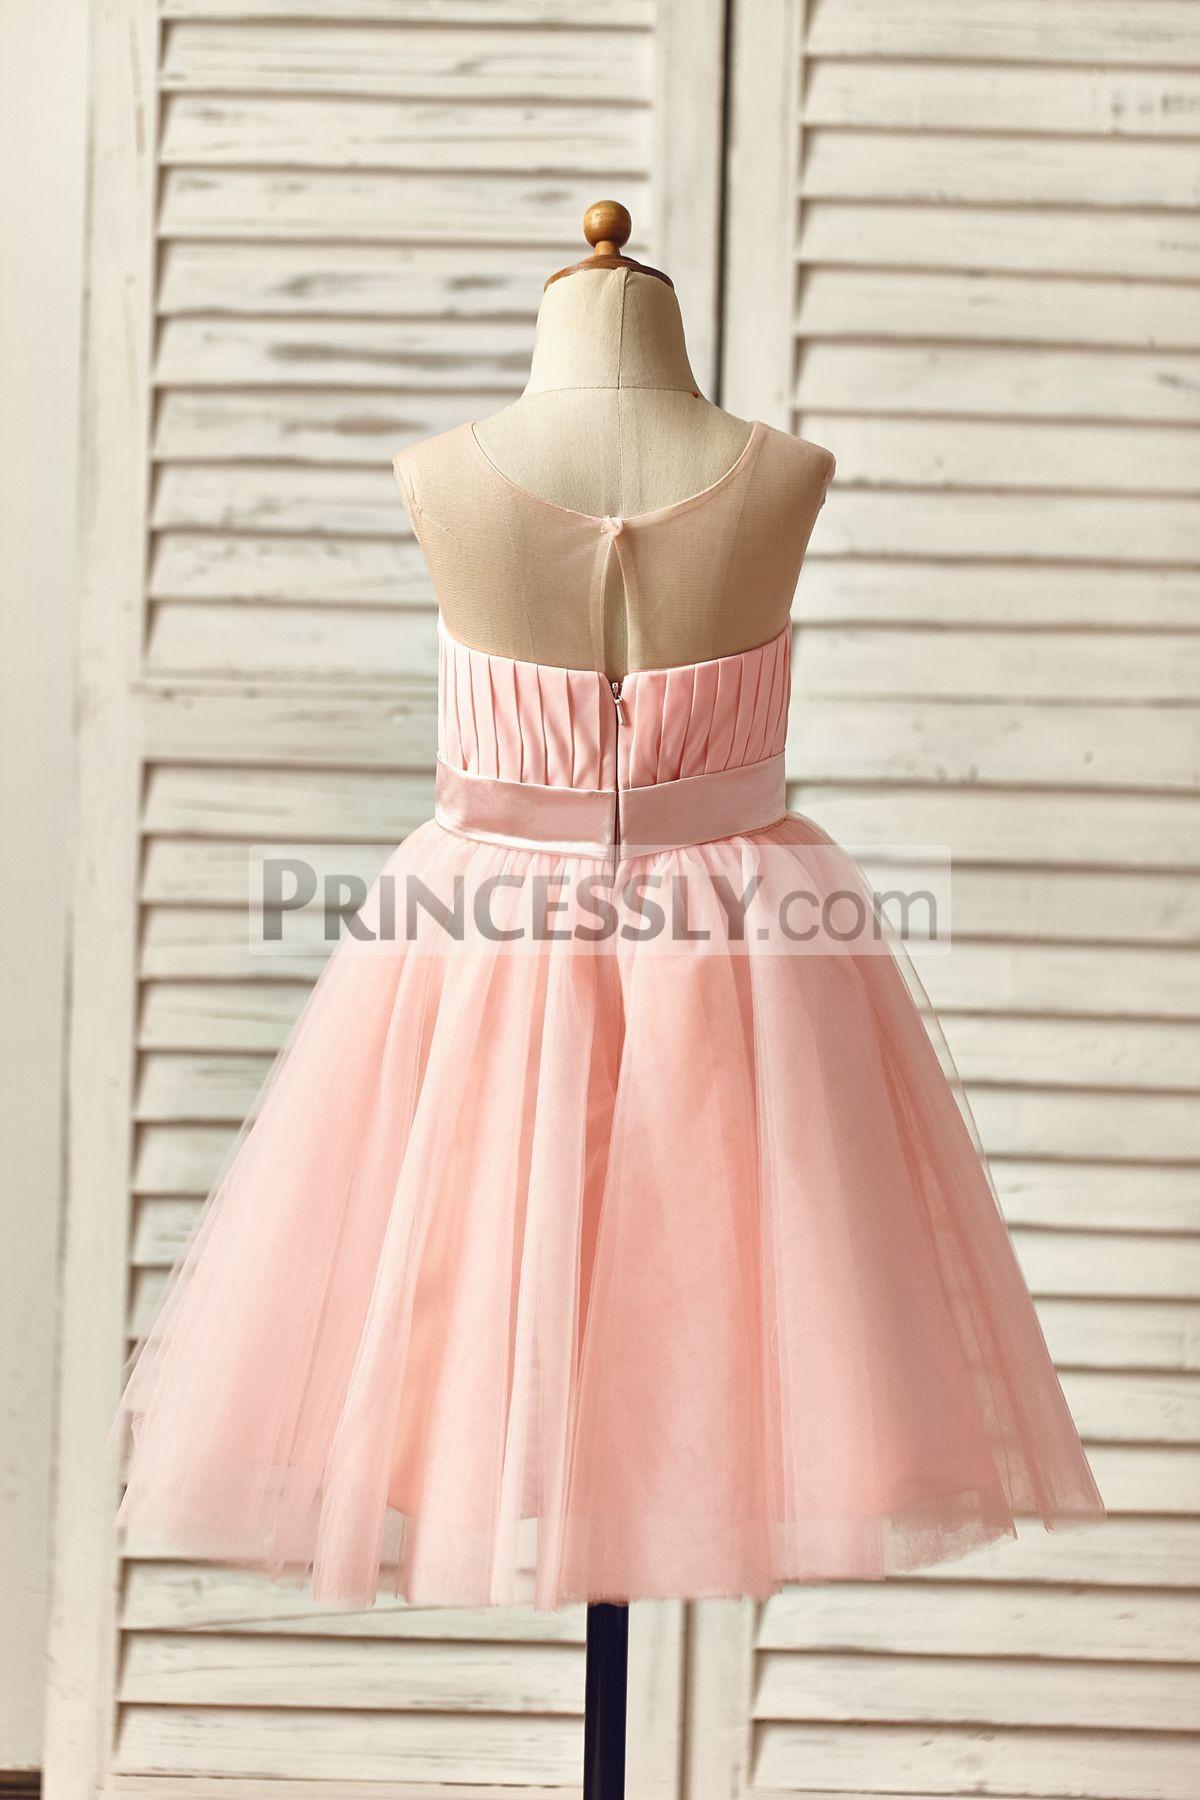 Pink Chiffon Tulle Skirt Satin Sash Princess Little Baby Girl Dress